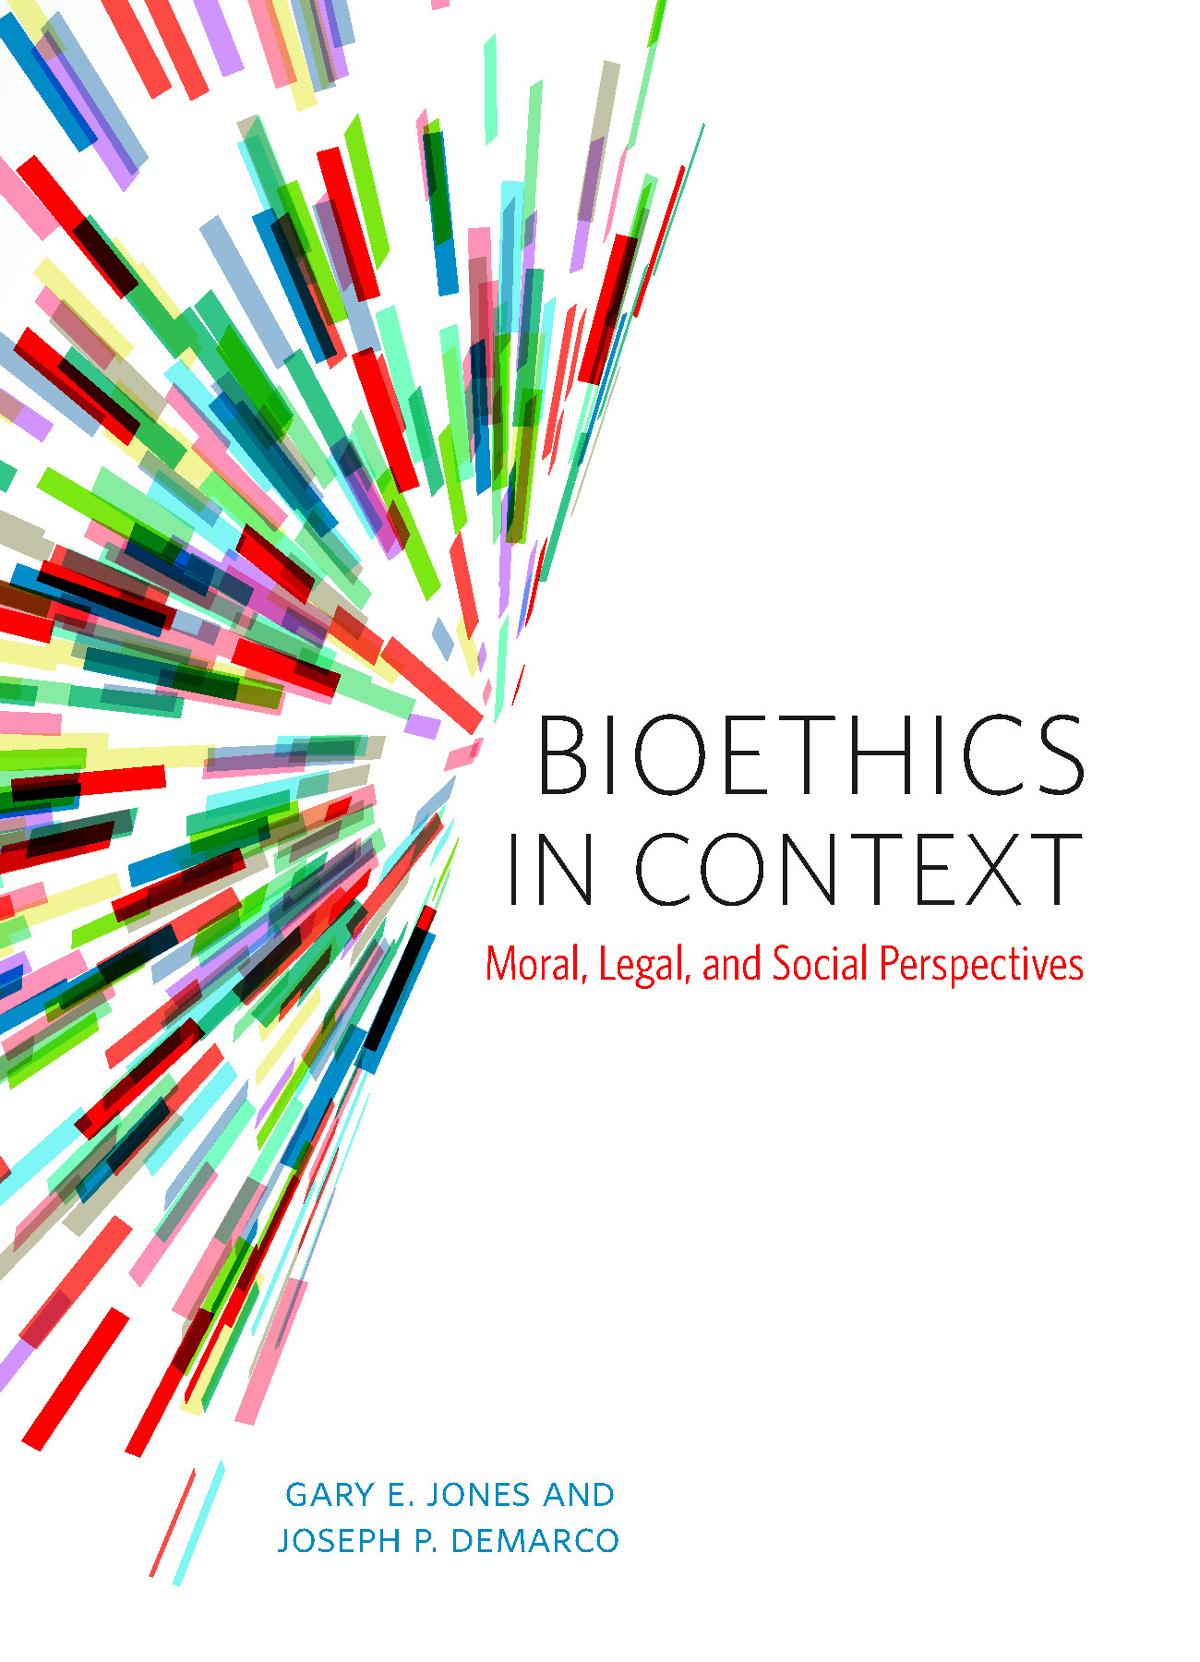 thesis on bioethics